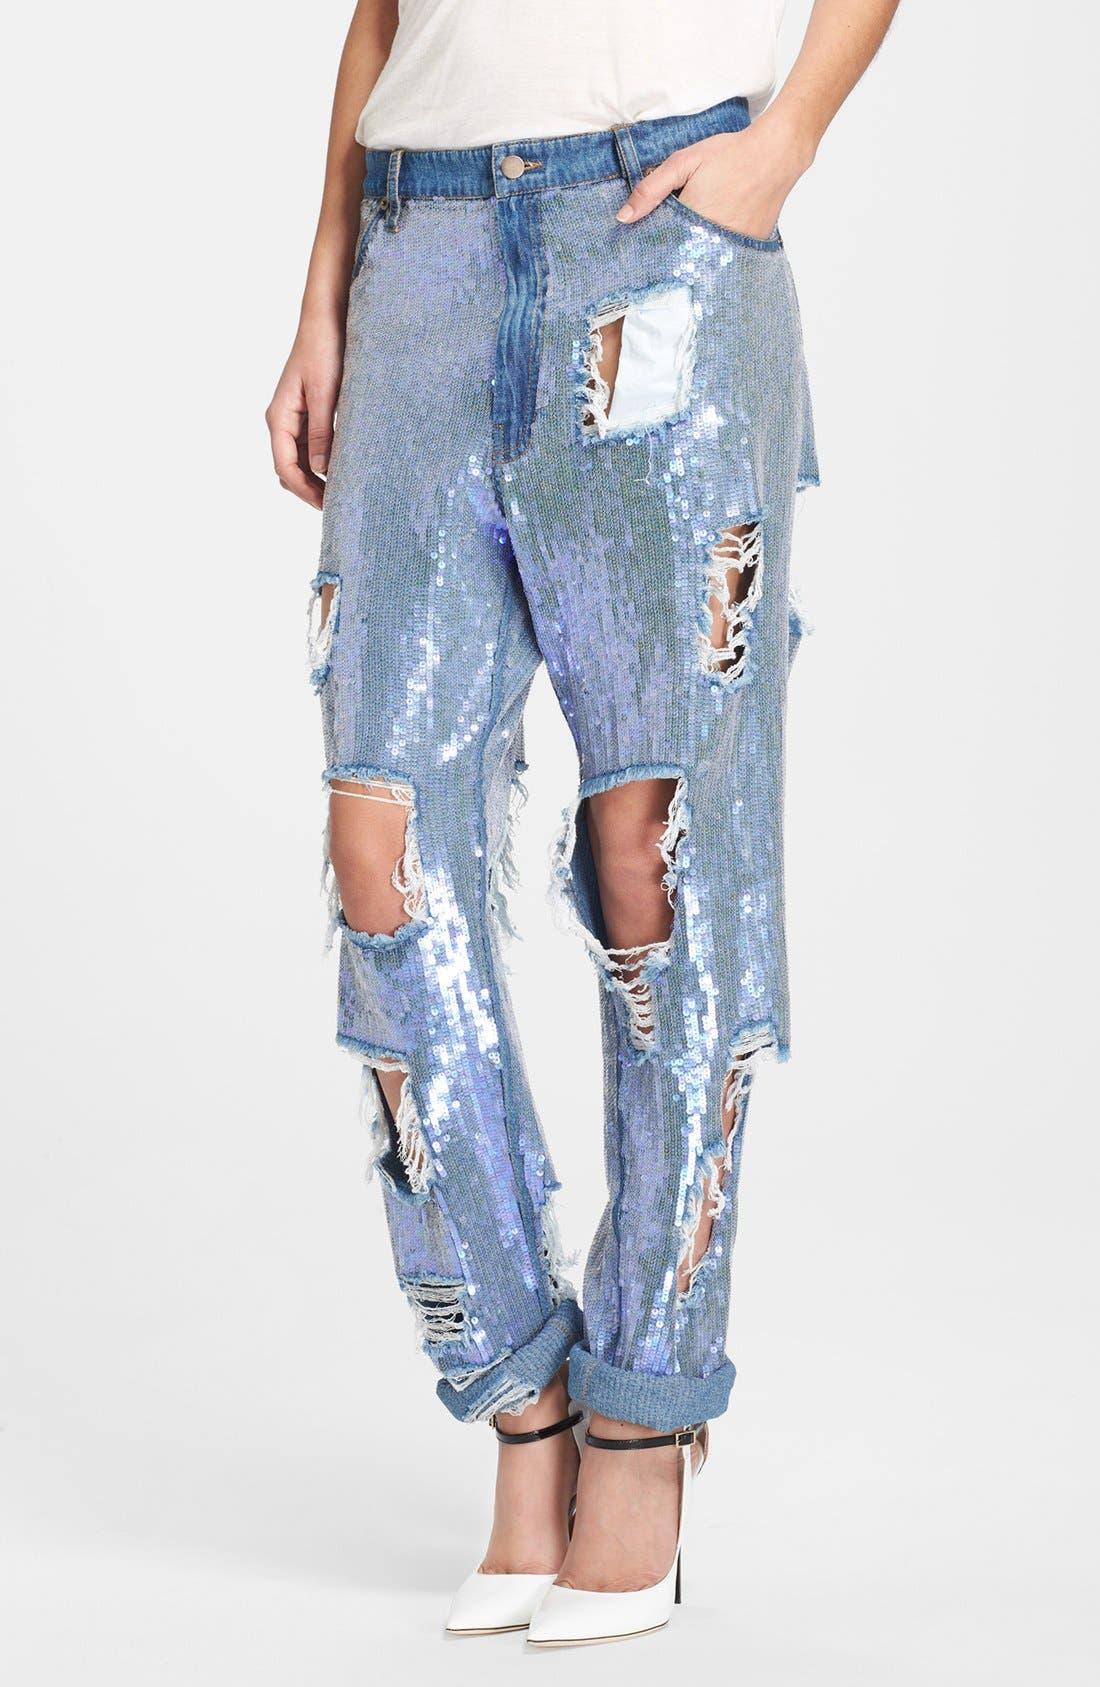 Ashish Destroyed Sequin Jeans